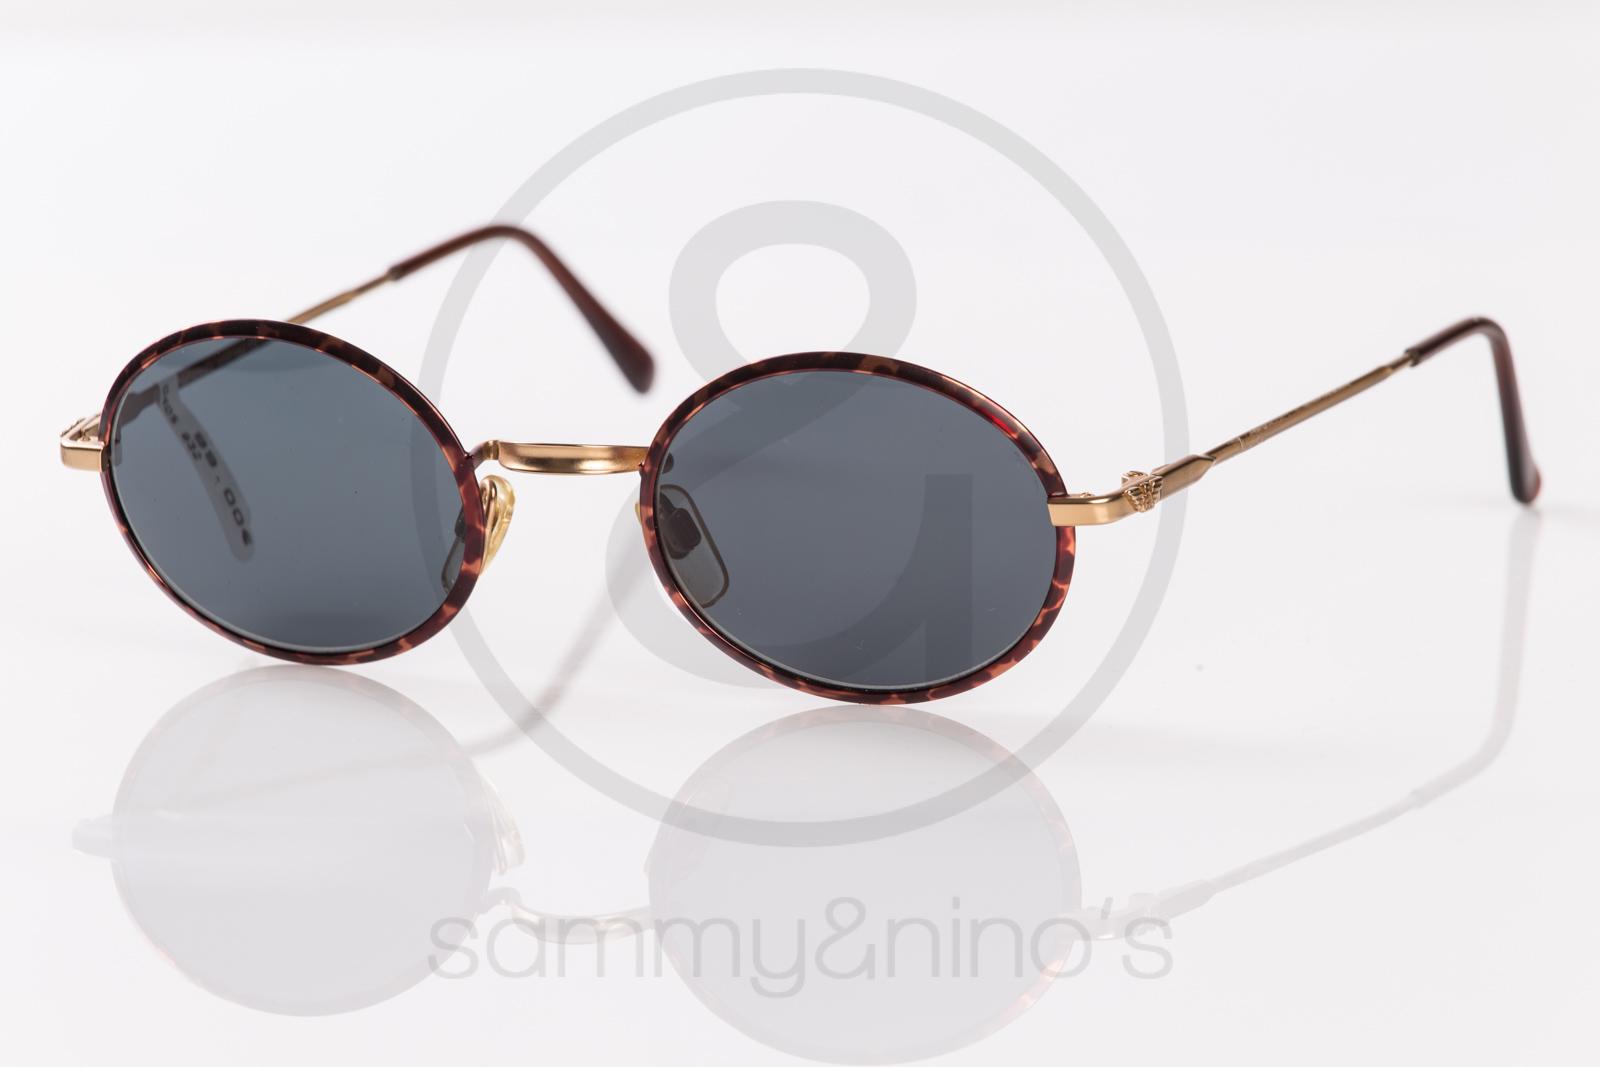 537044724ac6 Vintage Armani Sunglasses - Bitterroot Public Library